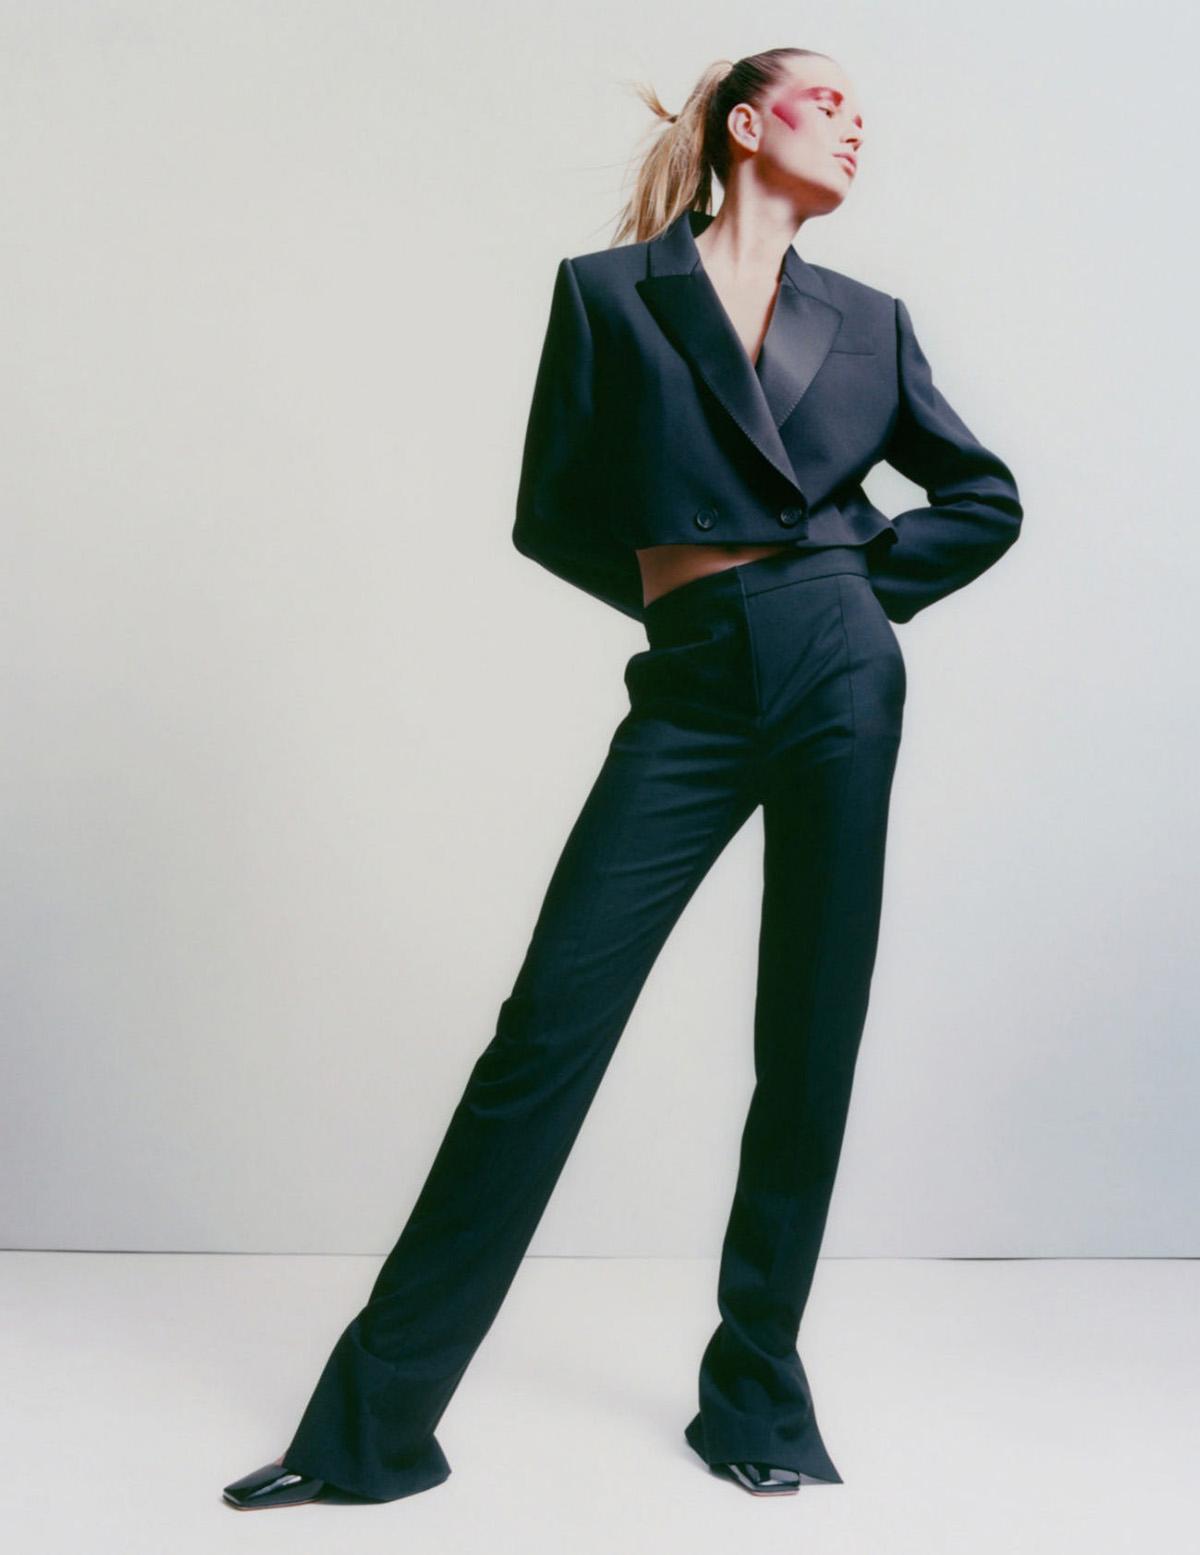 Anna Ewers by Sam Rock for Vogue Paris June-July 2021